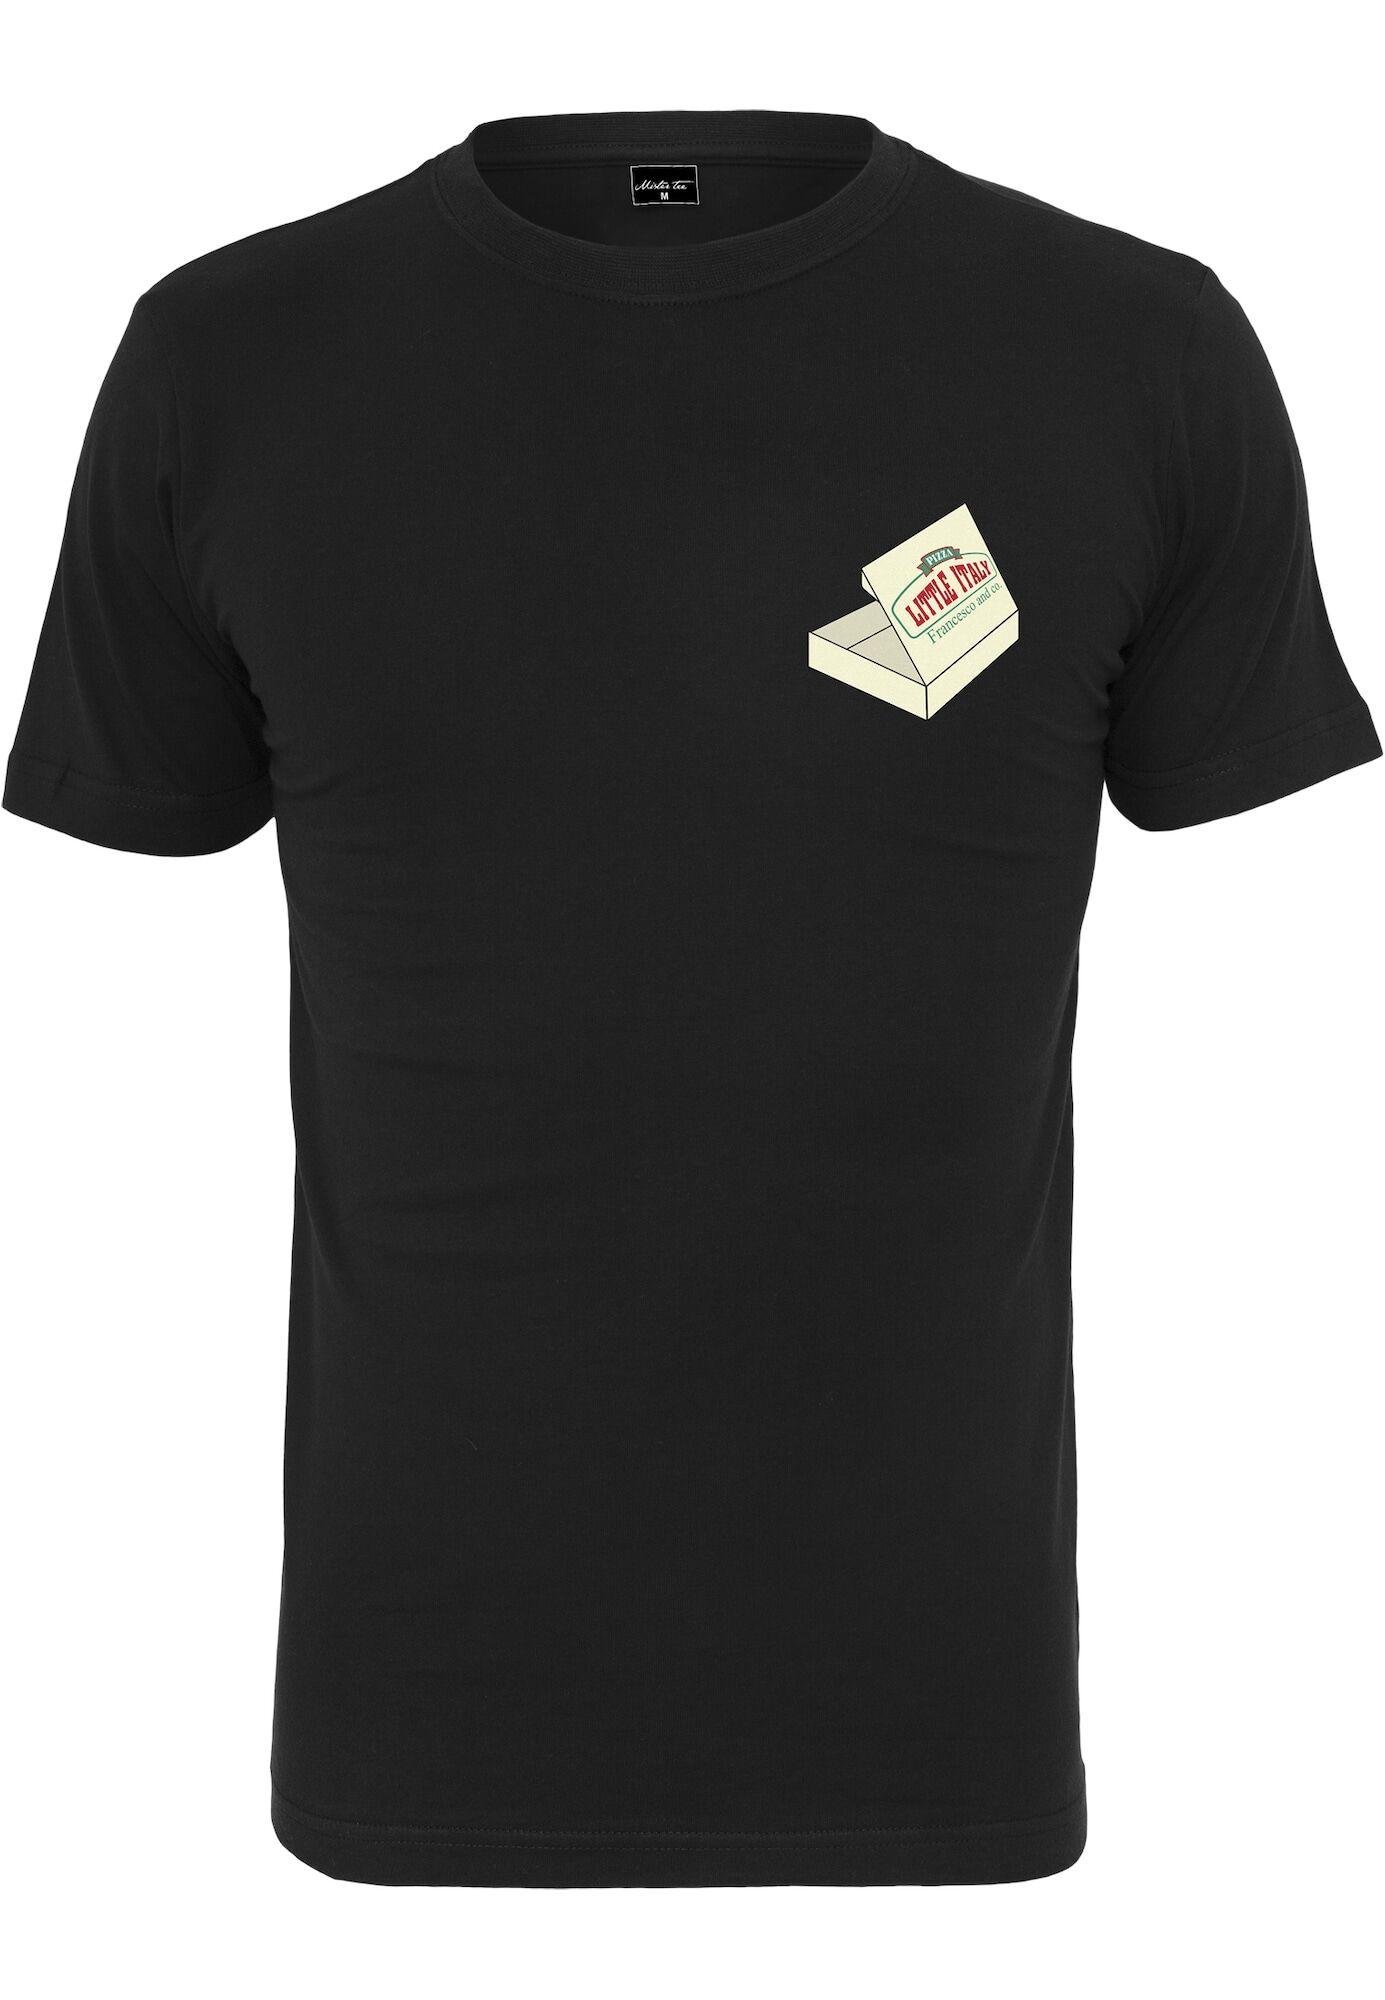 Tee T-Shirt 'Pizza Francesco'  - Noir - Taille: XXL - male